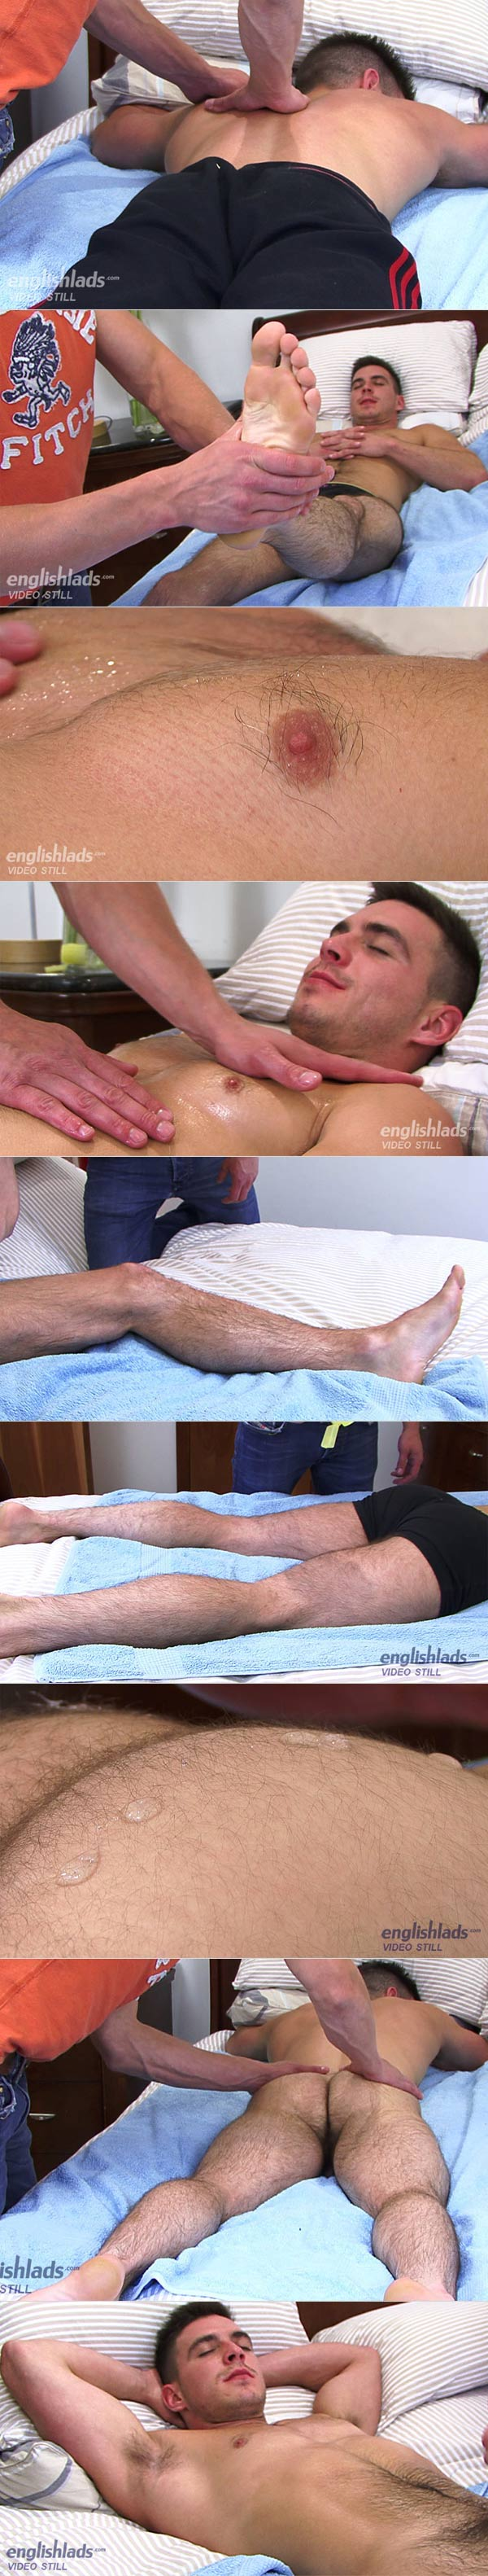 Patrick O'Brian (Massaged & Wanked Off) at EnglishLads